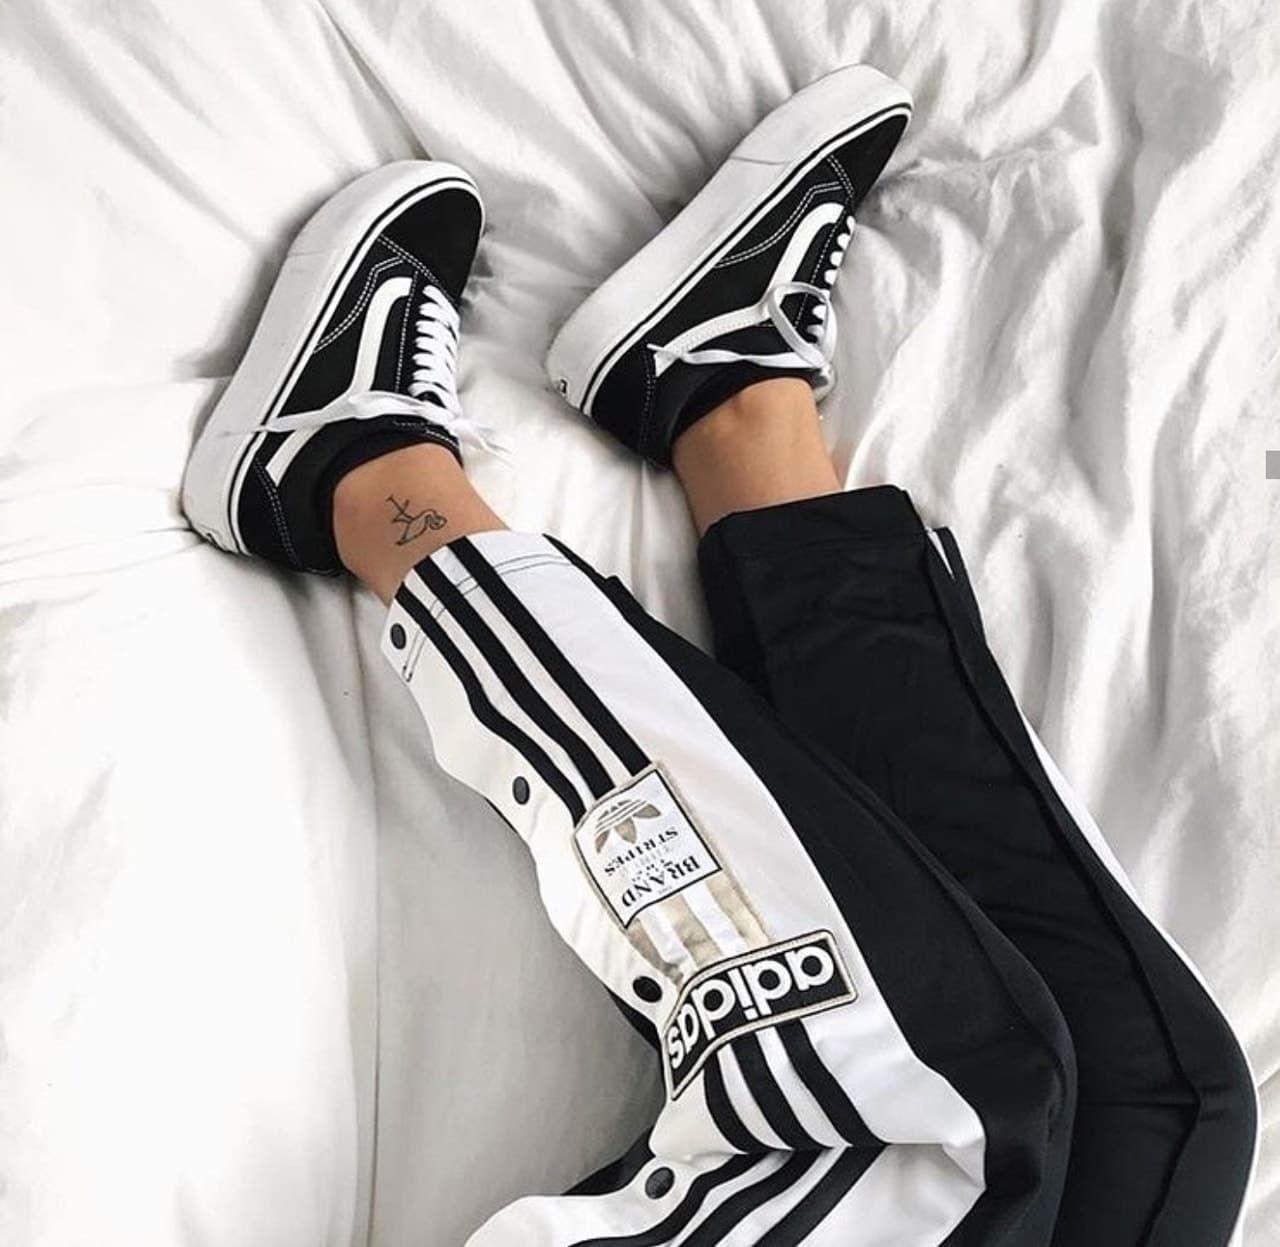 Adidas Trackpants- Vans Old Skool